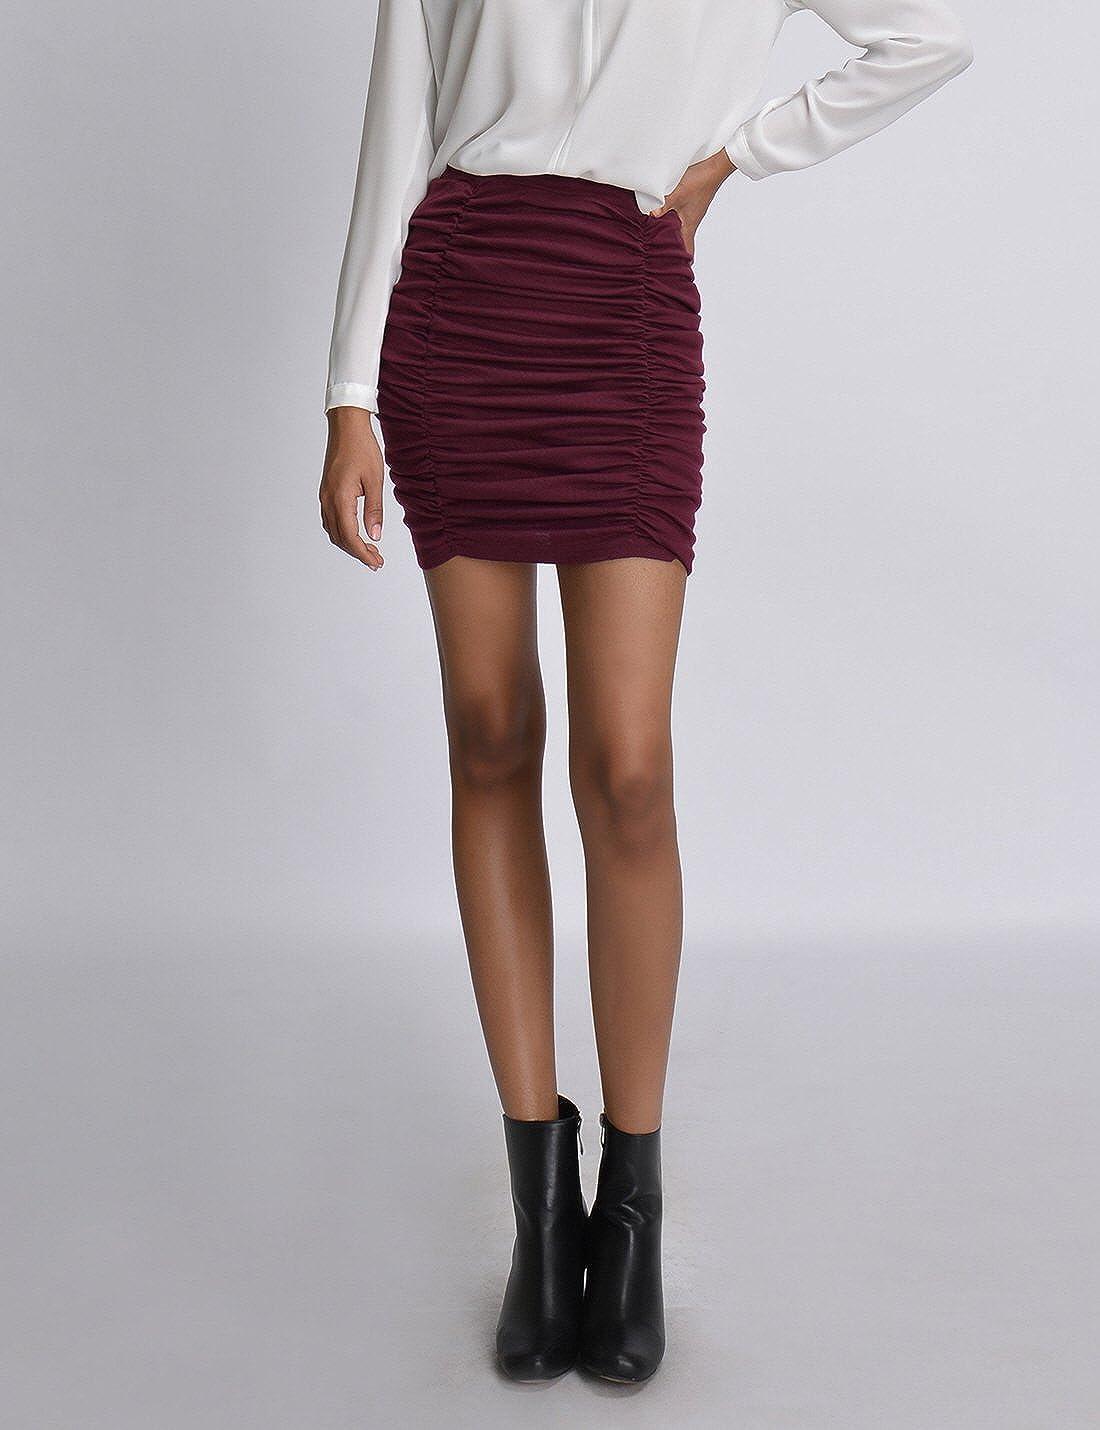 NEARKIN NKNKSSK65 Womens Slim Cut High Waist Elastic Shirring Midi Pencil Skirt Burgundy US XXS Tag Size XS